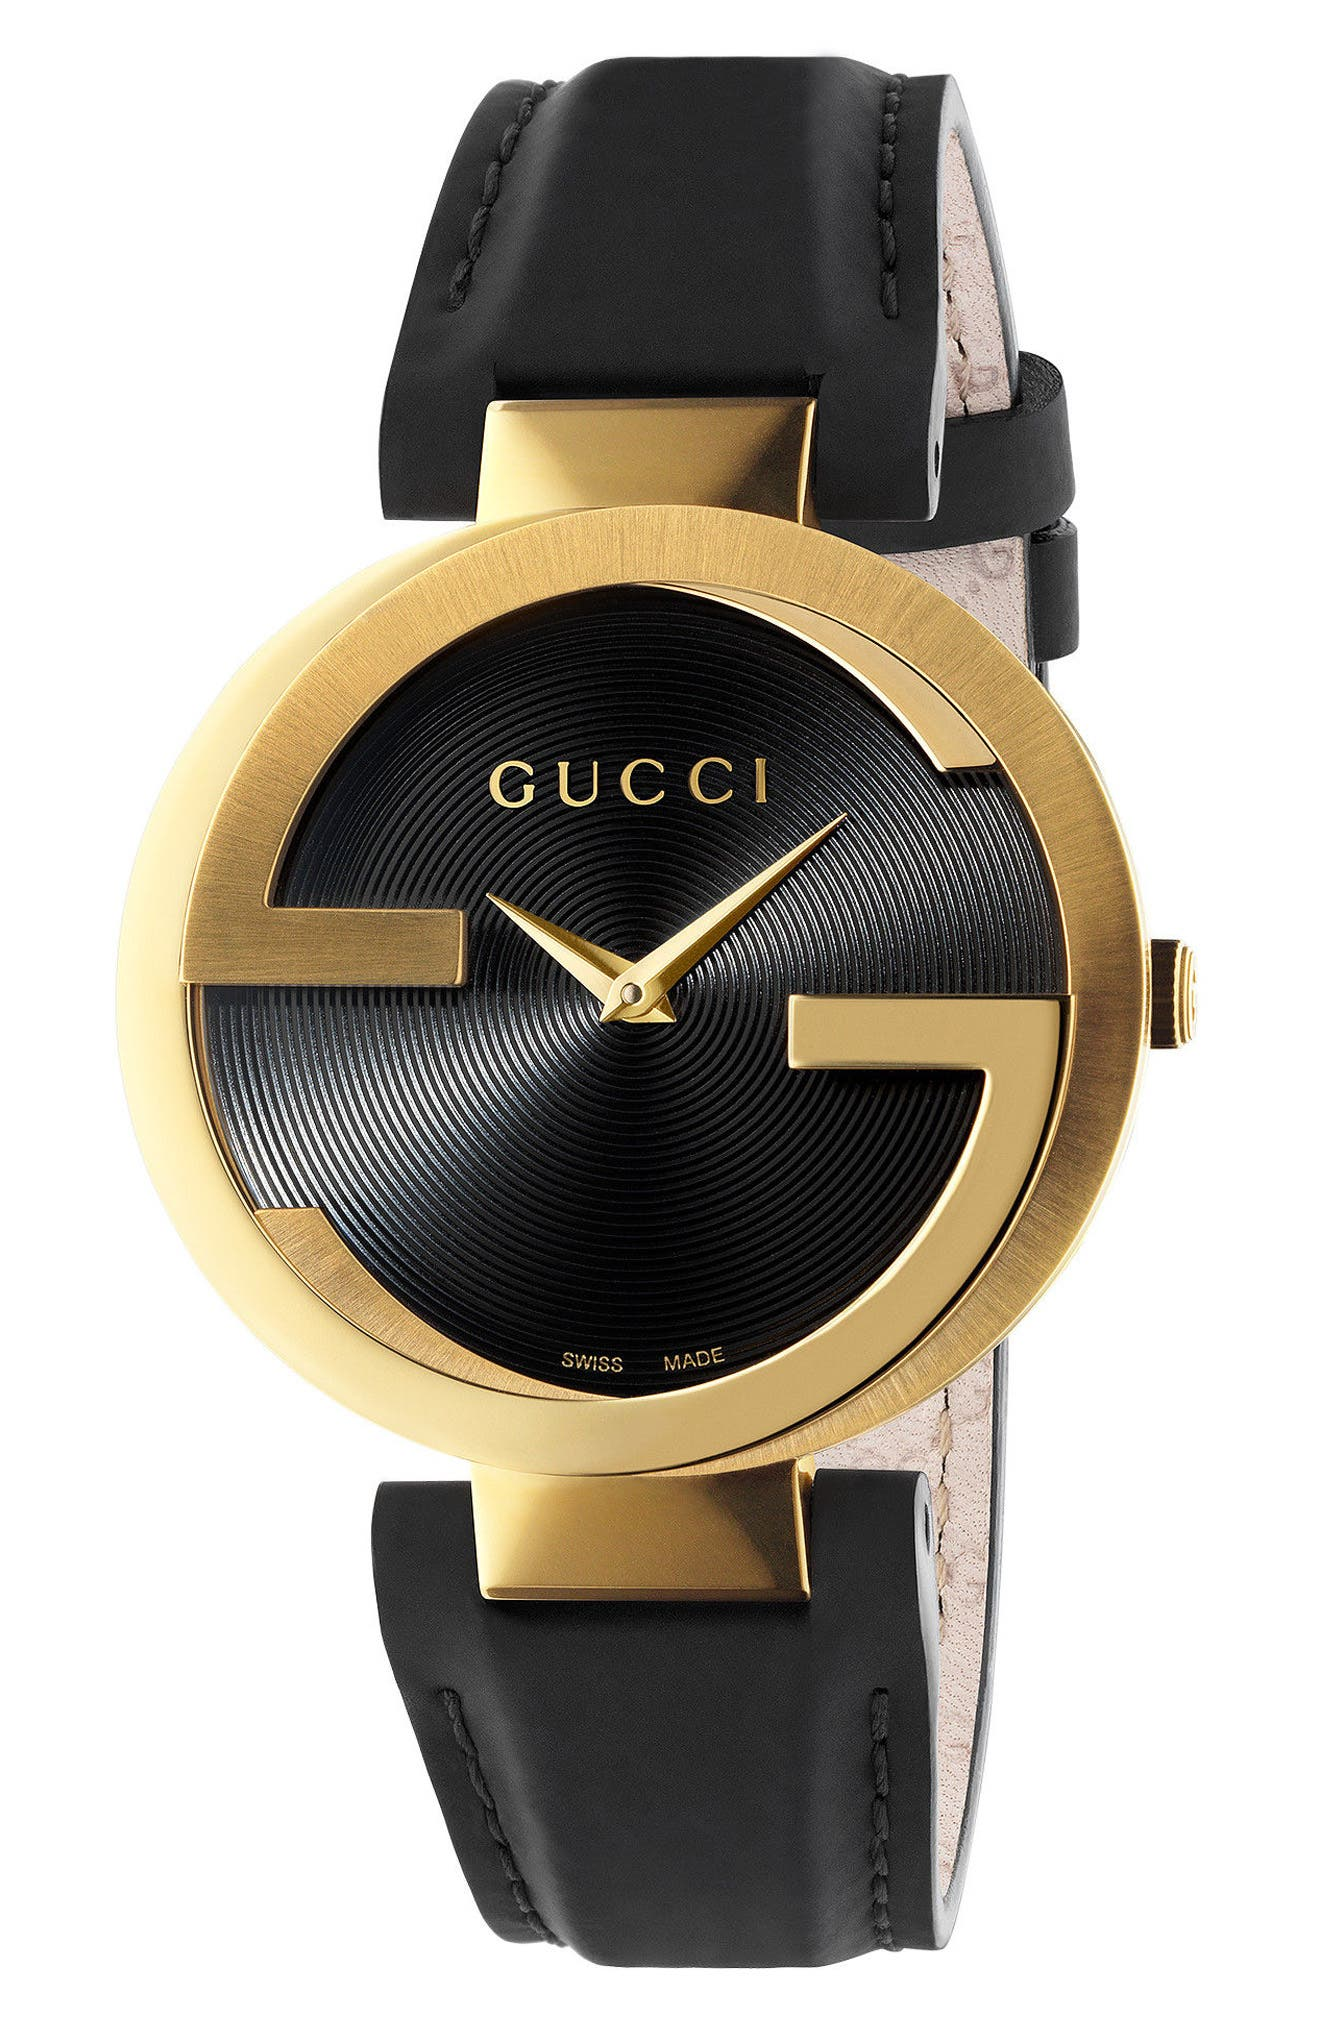 GUCCI Interlocking Leather Strap Watch, 37mm, Main, color, BLACK/ GOLD